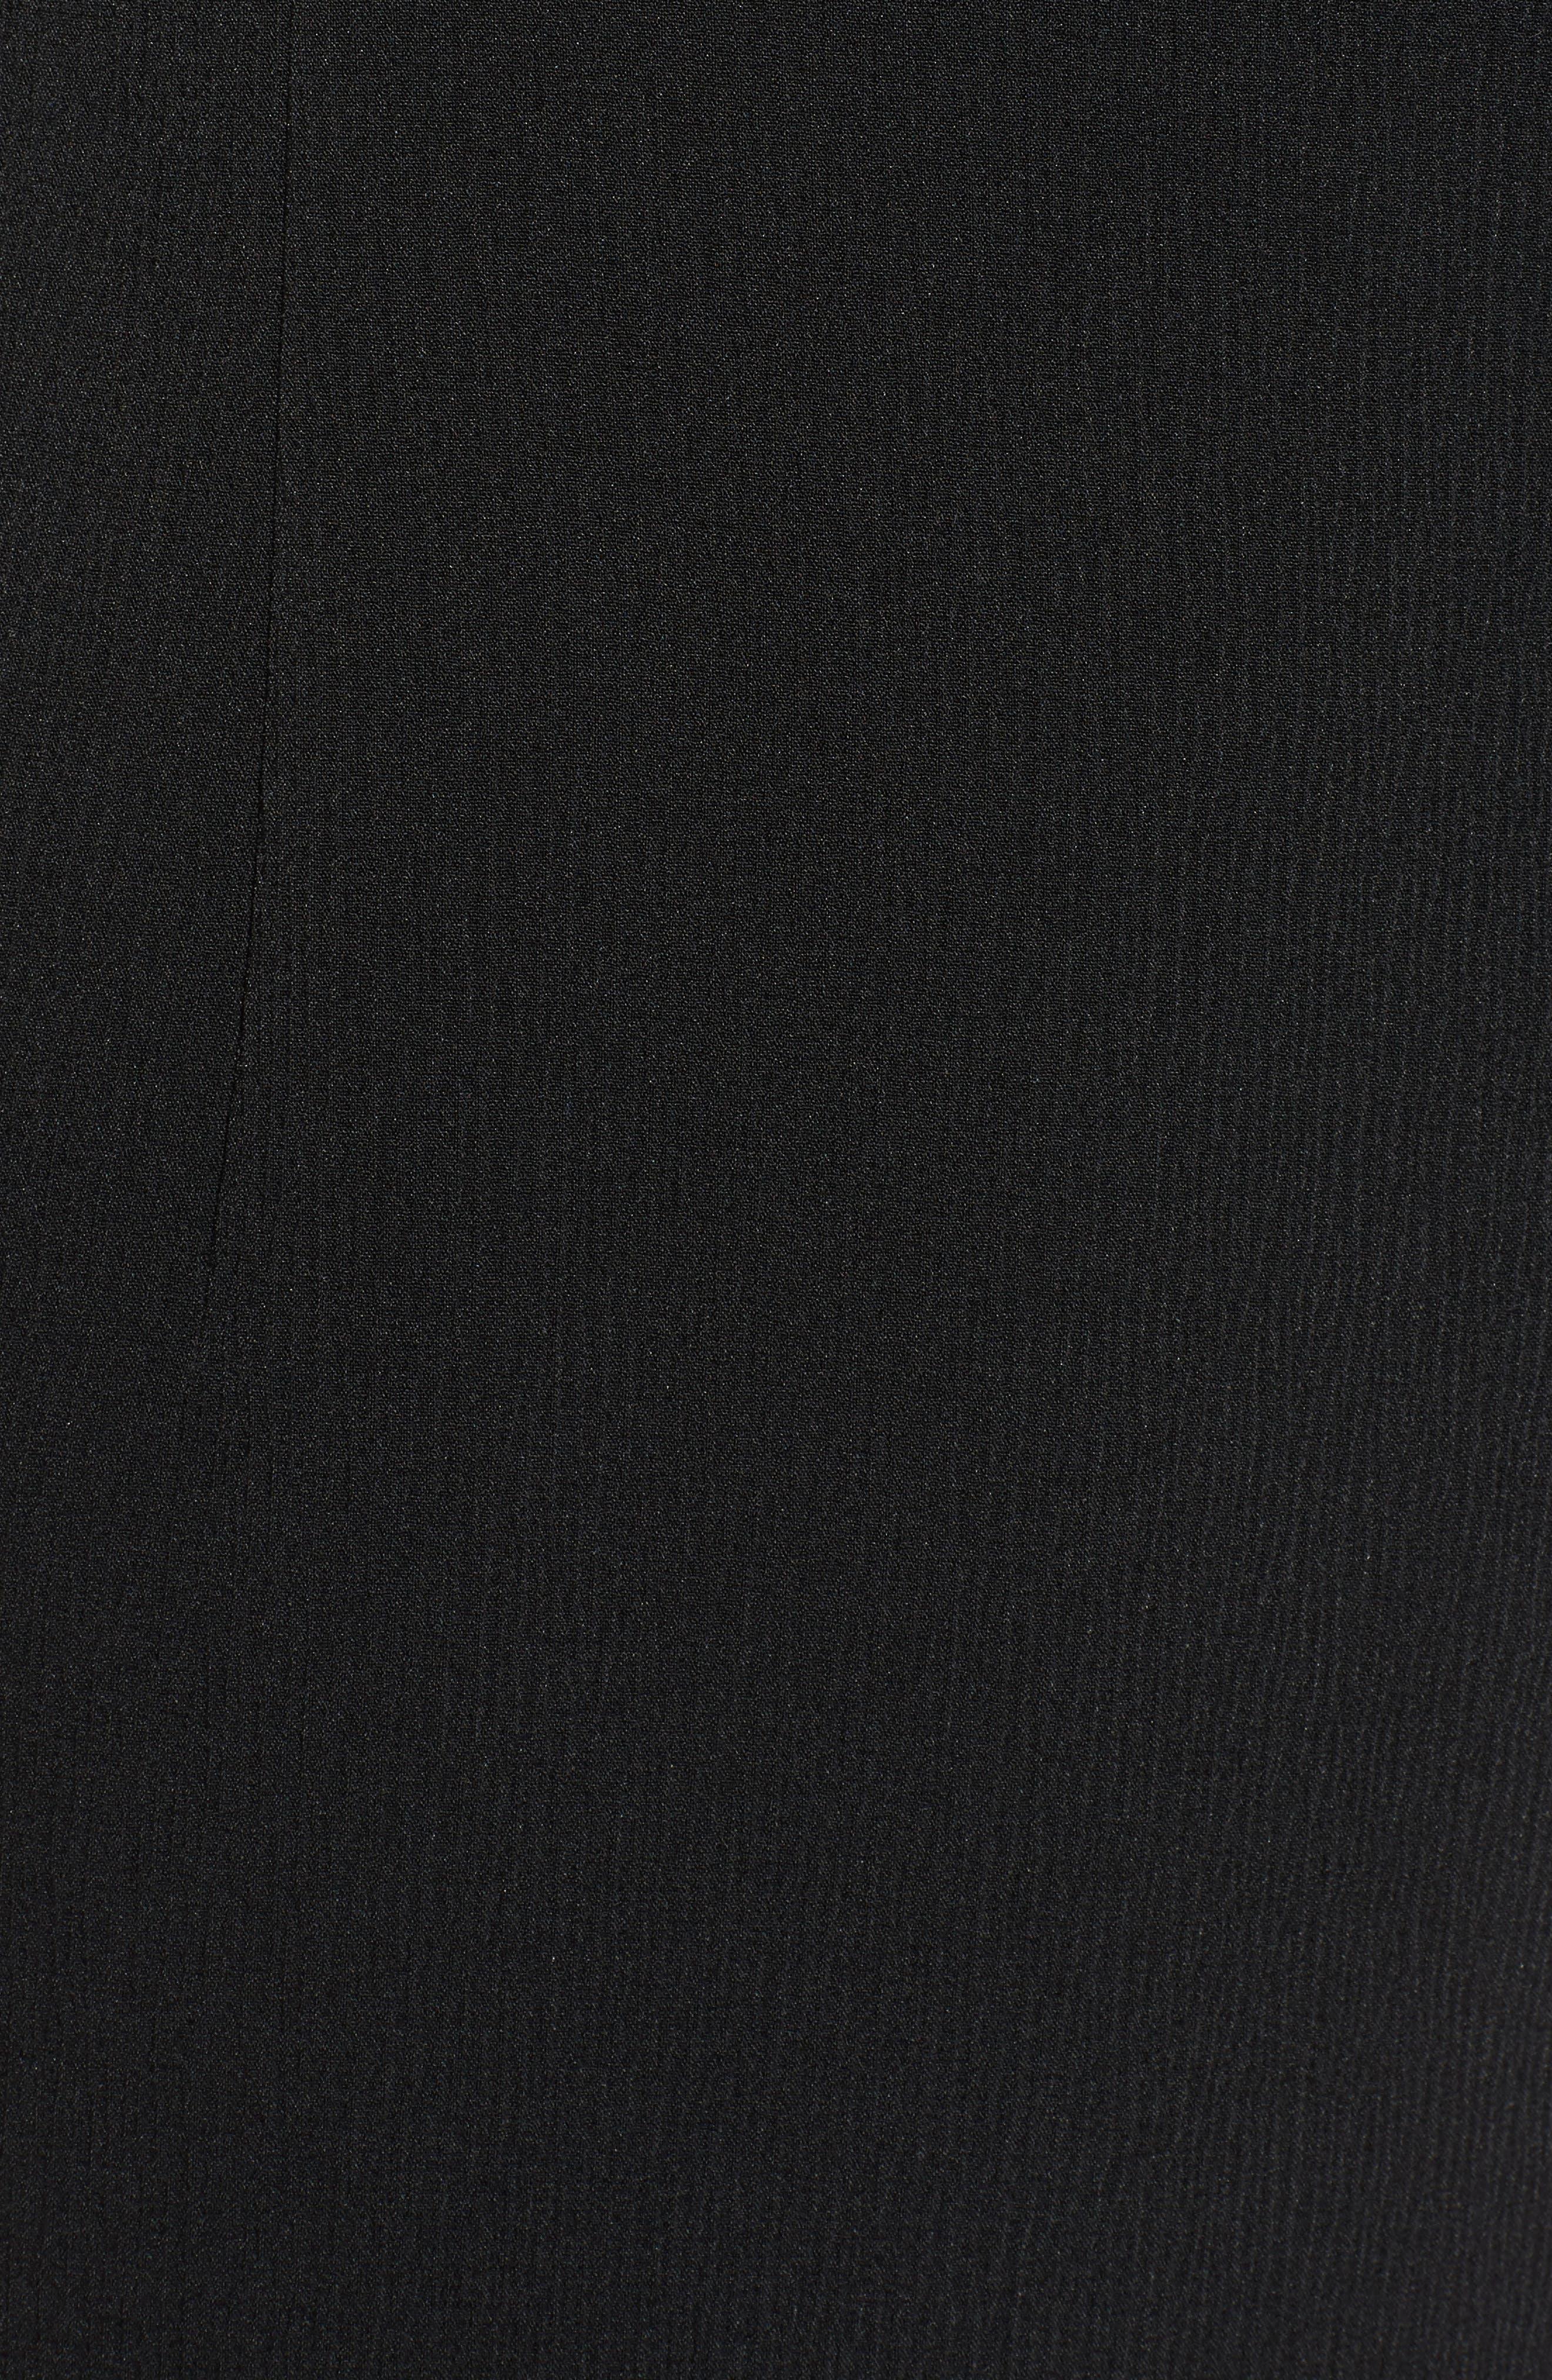 Dadena Crepe Sheath Dress,                             Alternate thumbnail 5, color,